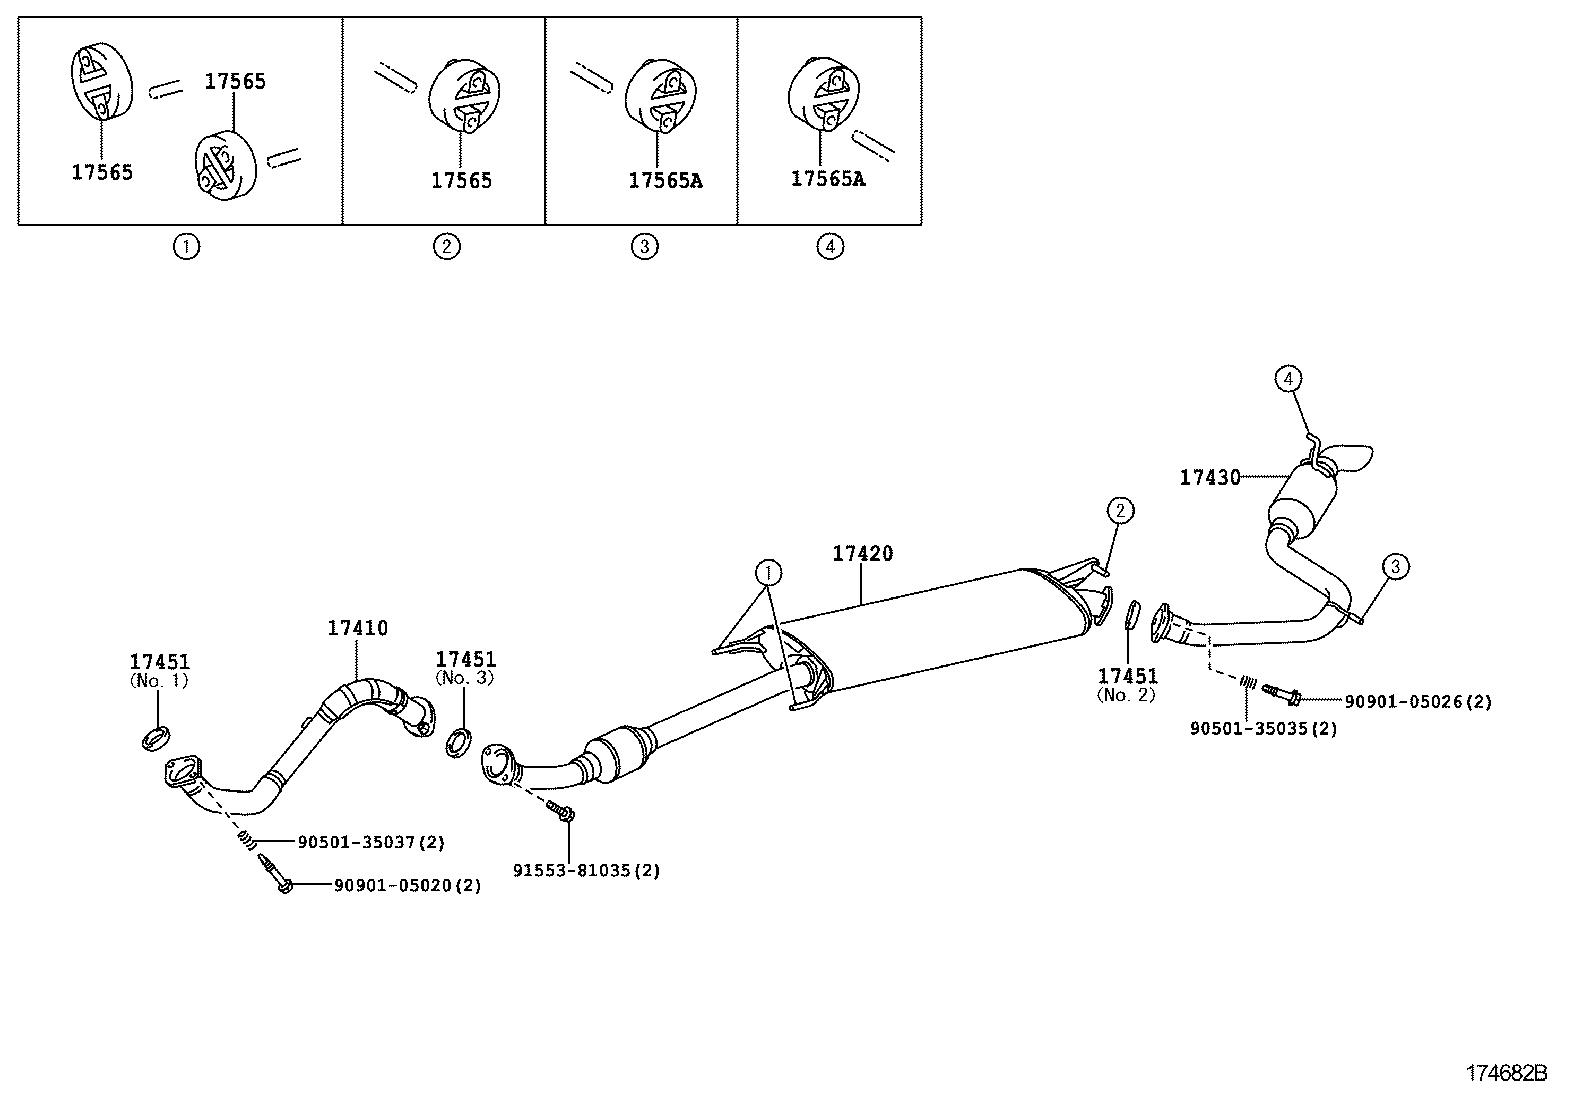 [EQHS_1162]  TOYOTA RAV4ACA33R-ANMGKQ - TOOL-ENGINE-FUEL - EXHAUST PIPE | Japan Parts EU | 2007 Rav4 Engine Diagram |  | Japan Parts EU